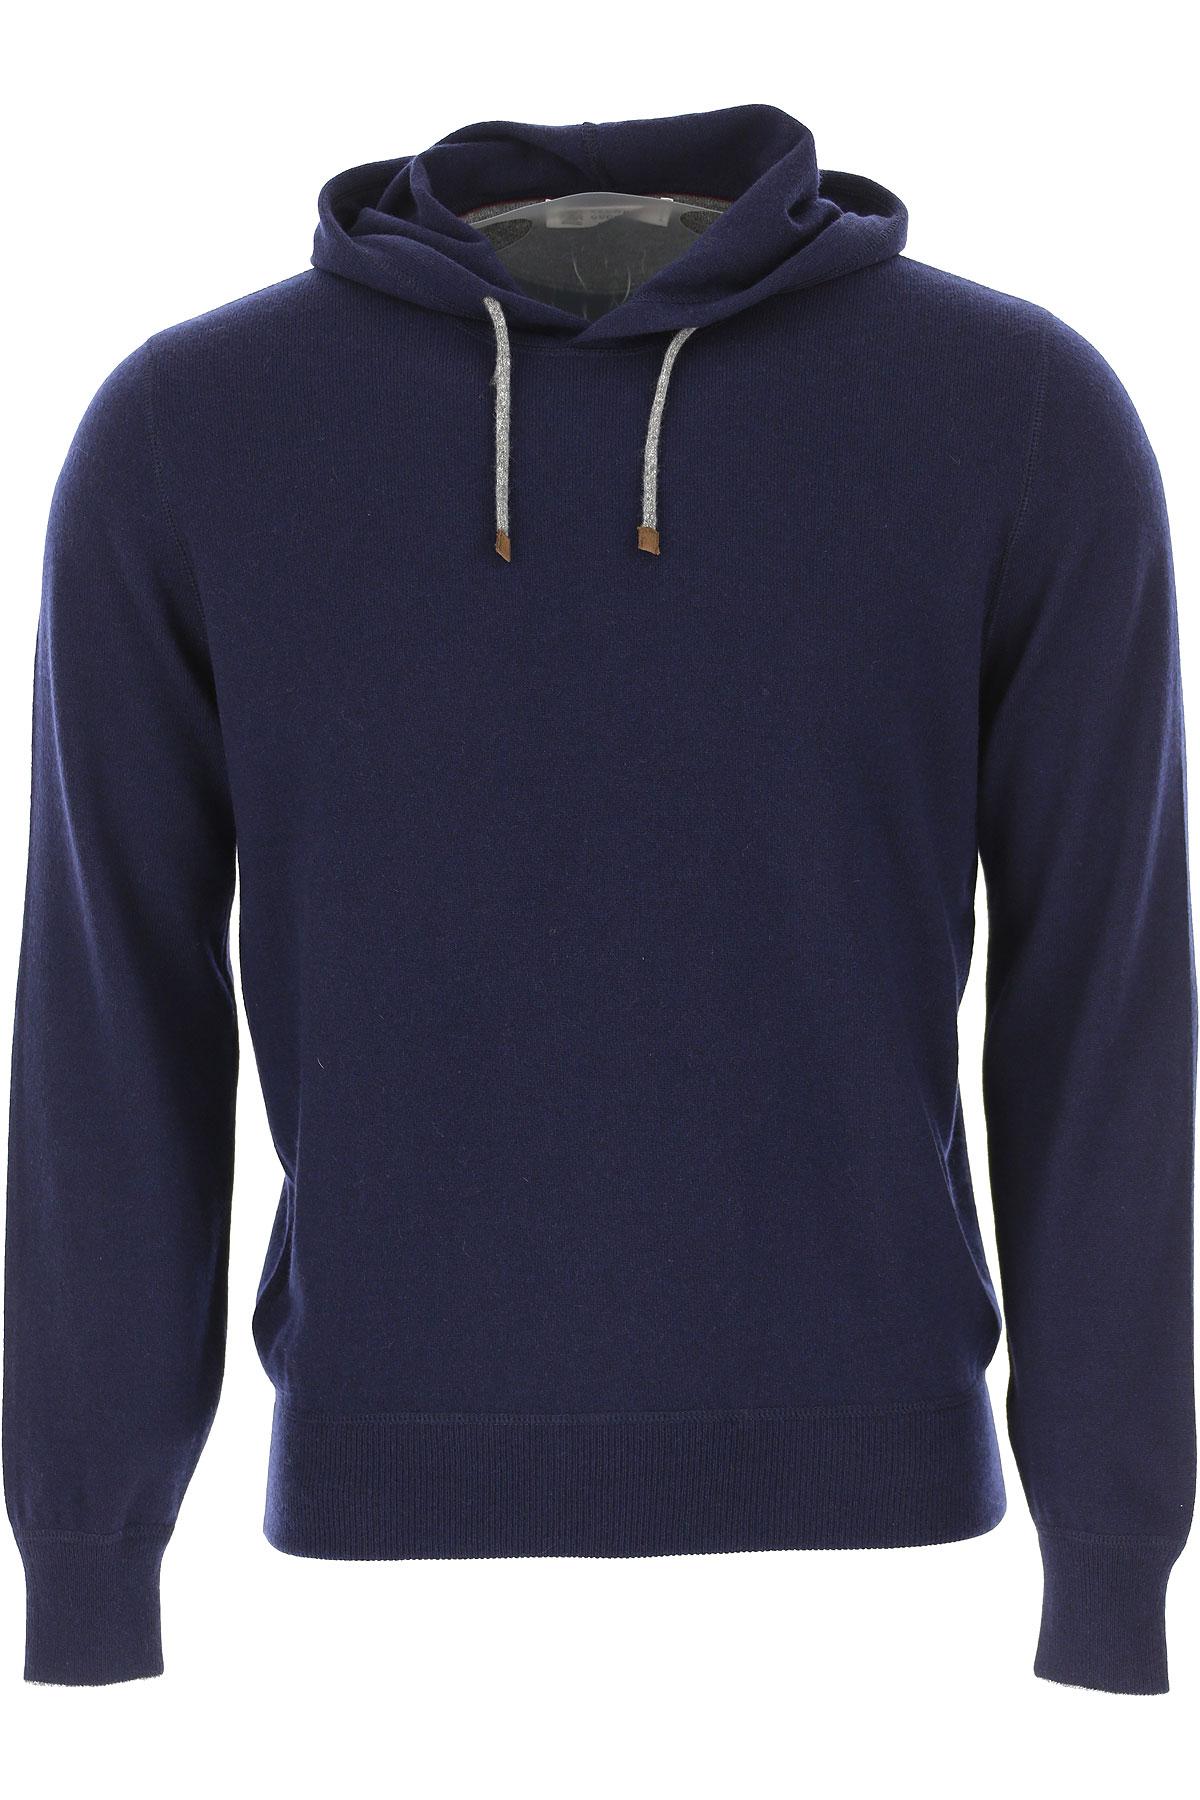 Brunello Cucinelli Sweater for Men Jumper On Sale, navy, Cashmere, 2019, L M